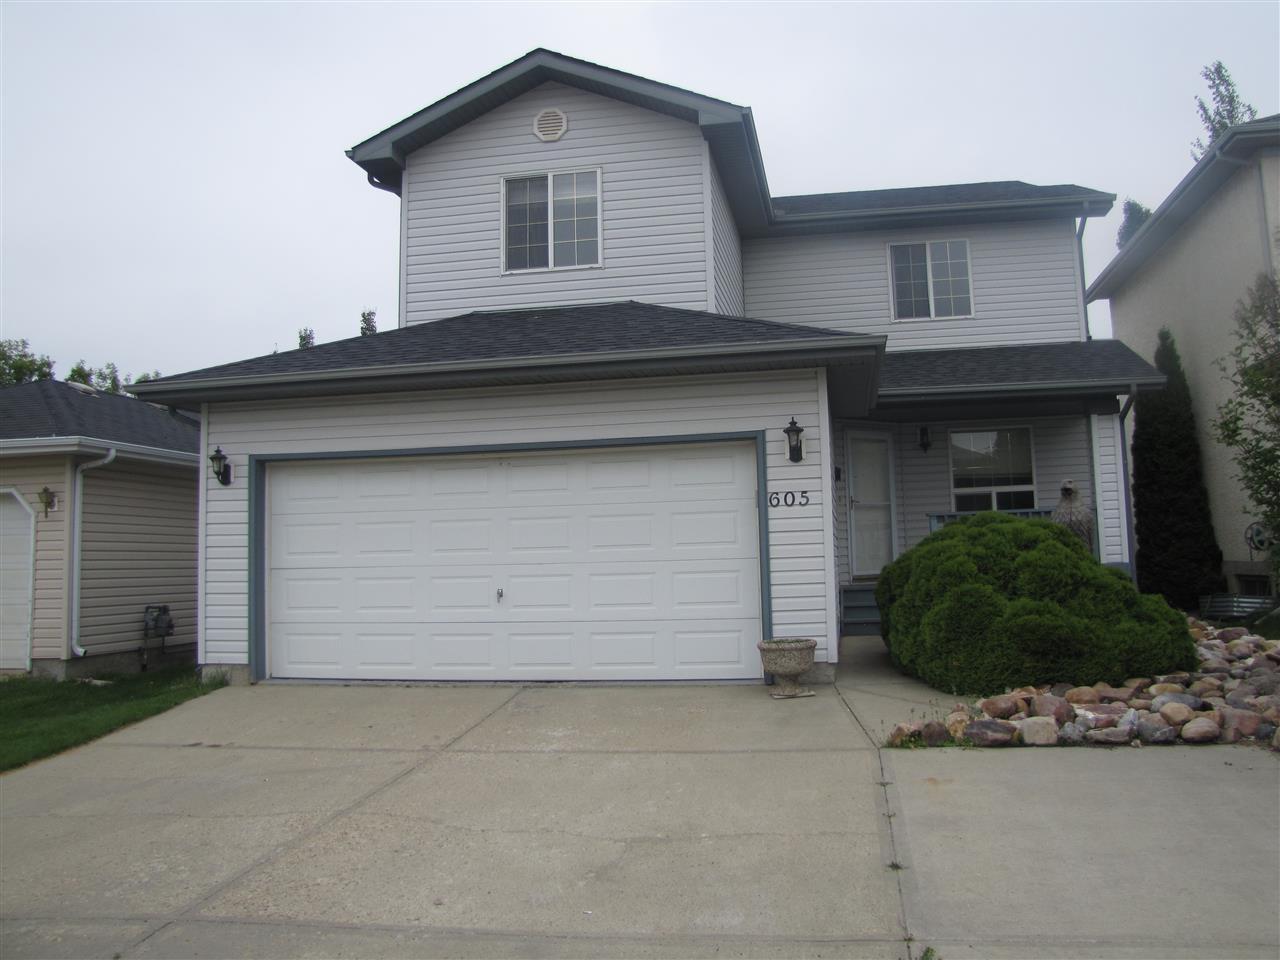 Main Photo: 605 Bevington Place in Edmonton: Zone 58 House for sale : MLS®# E4165361